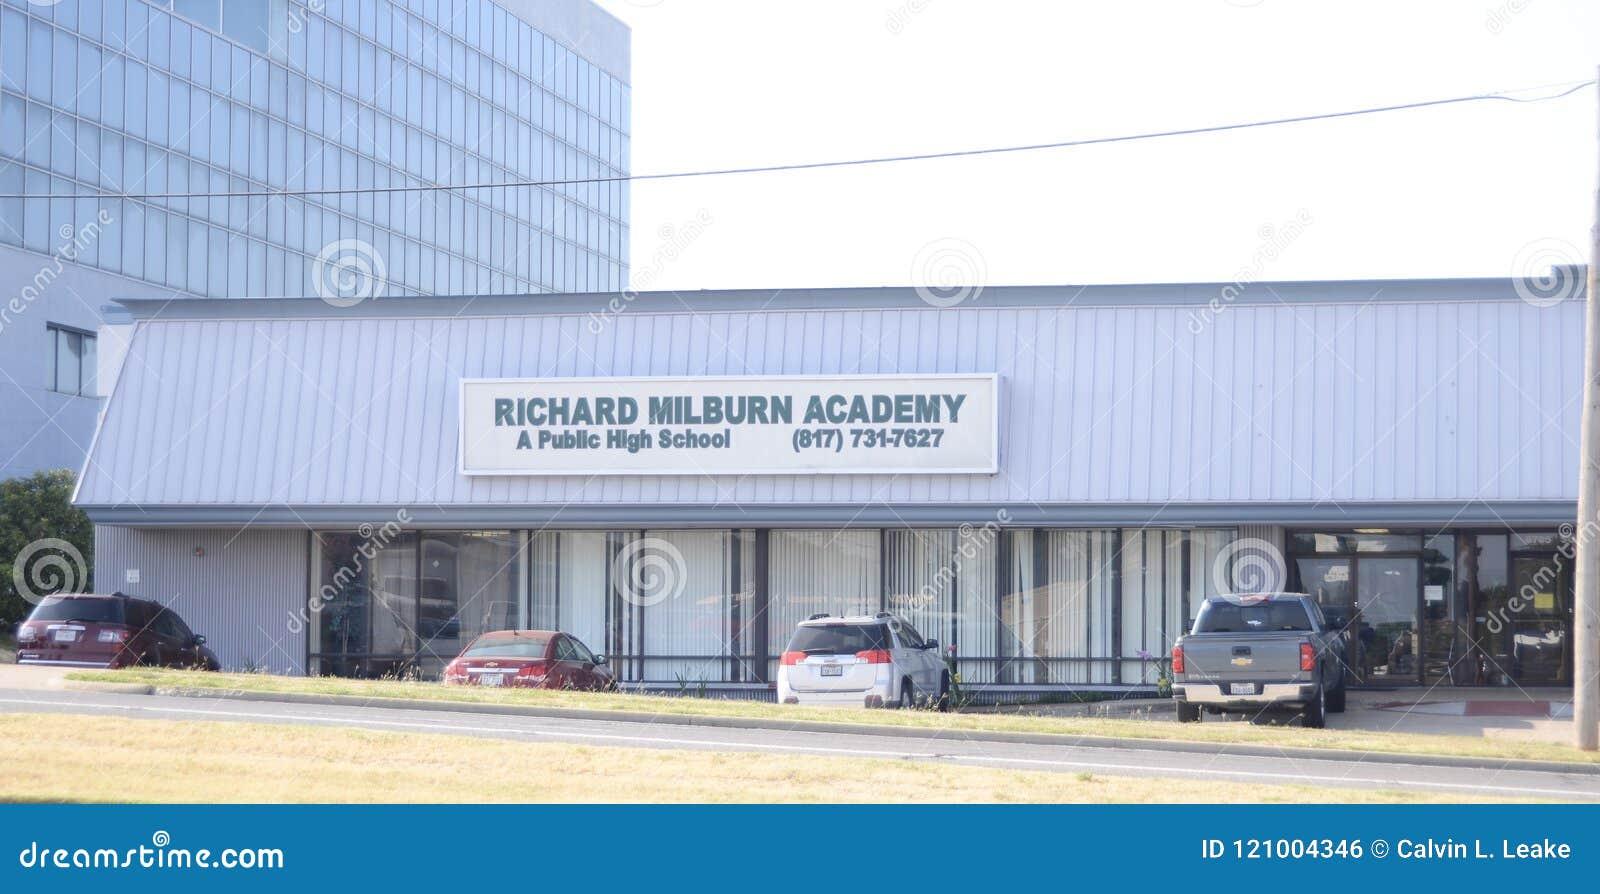 Richard Milburn Academy, Fort Worth, Texas